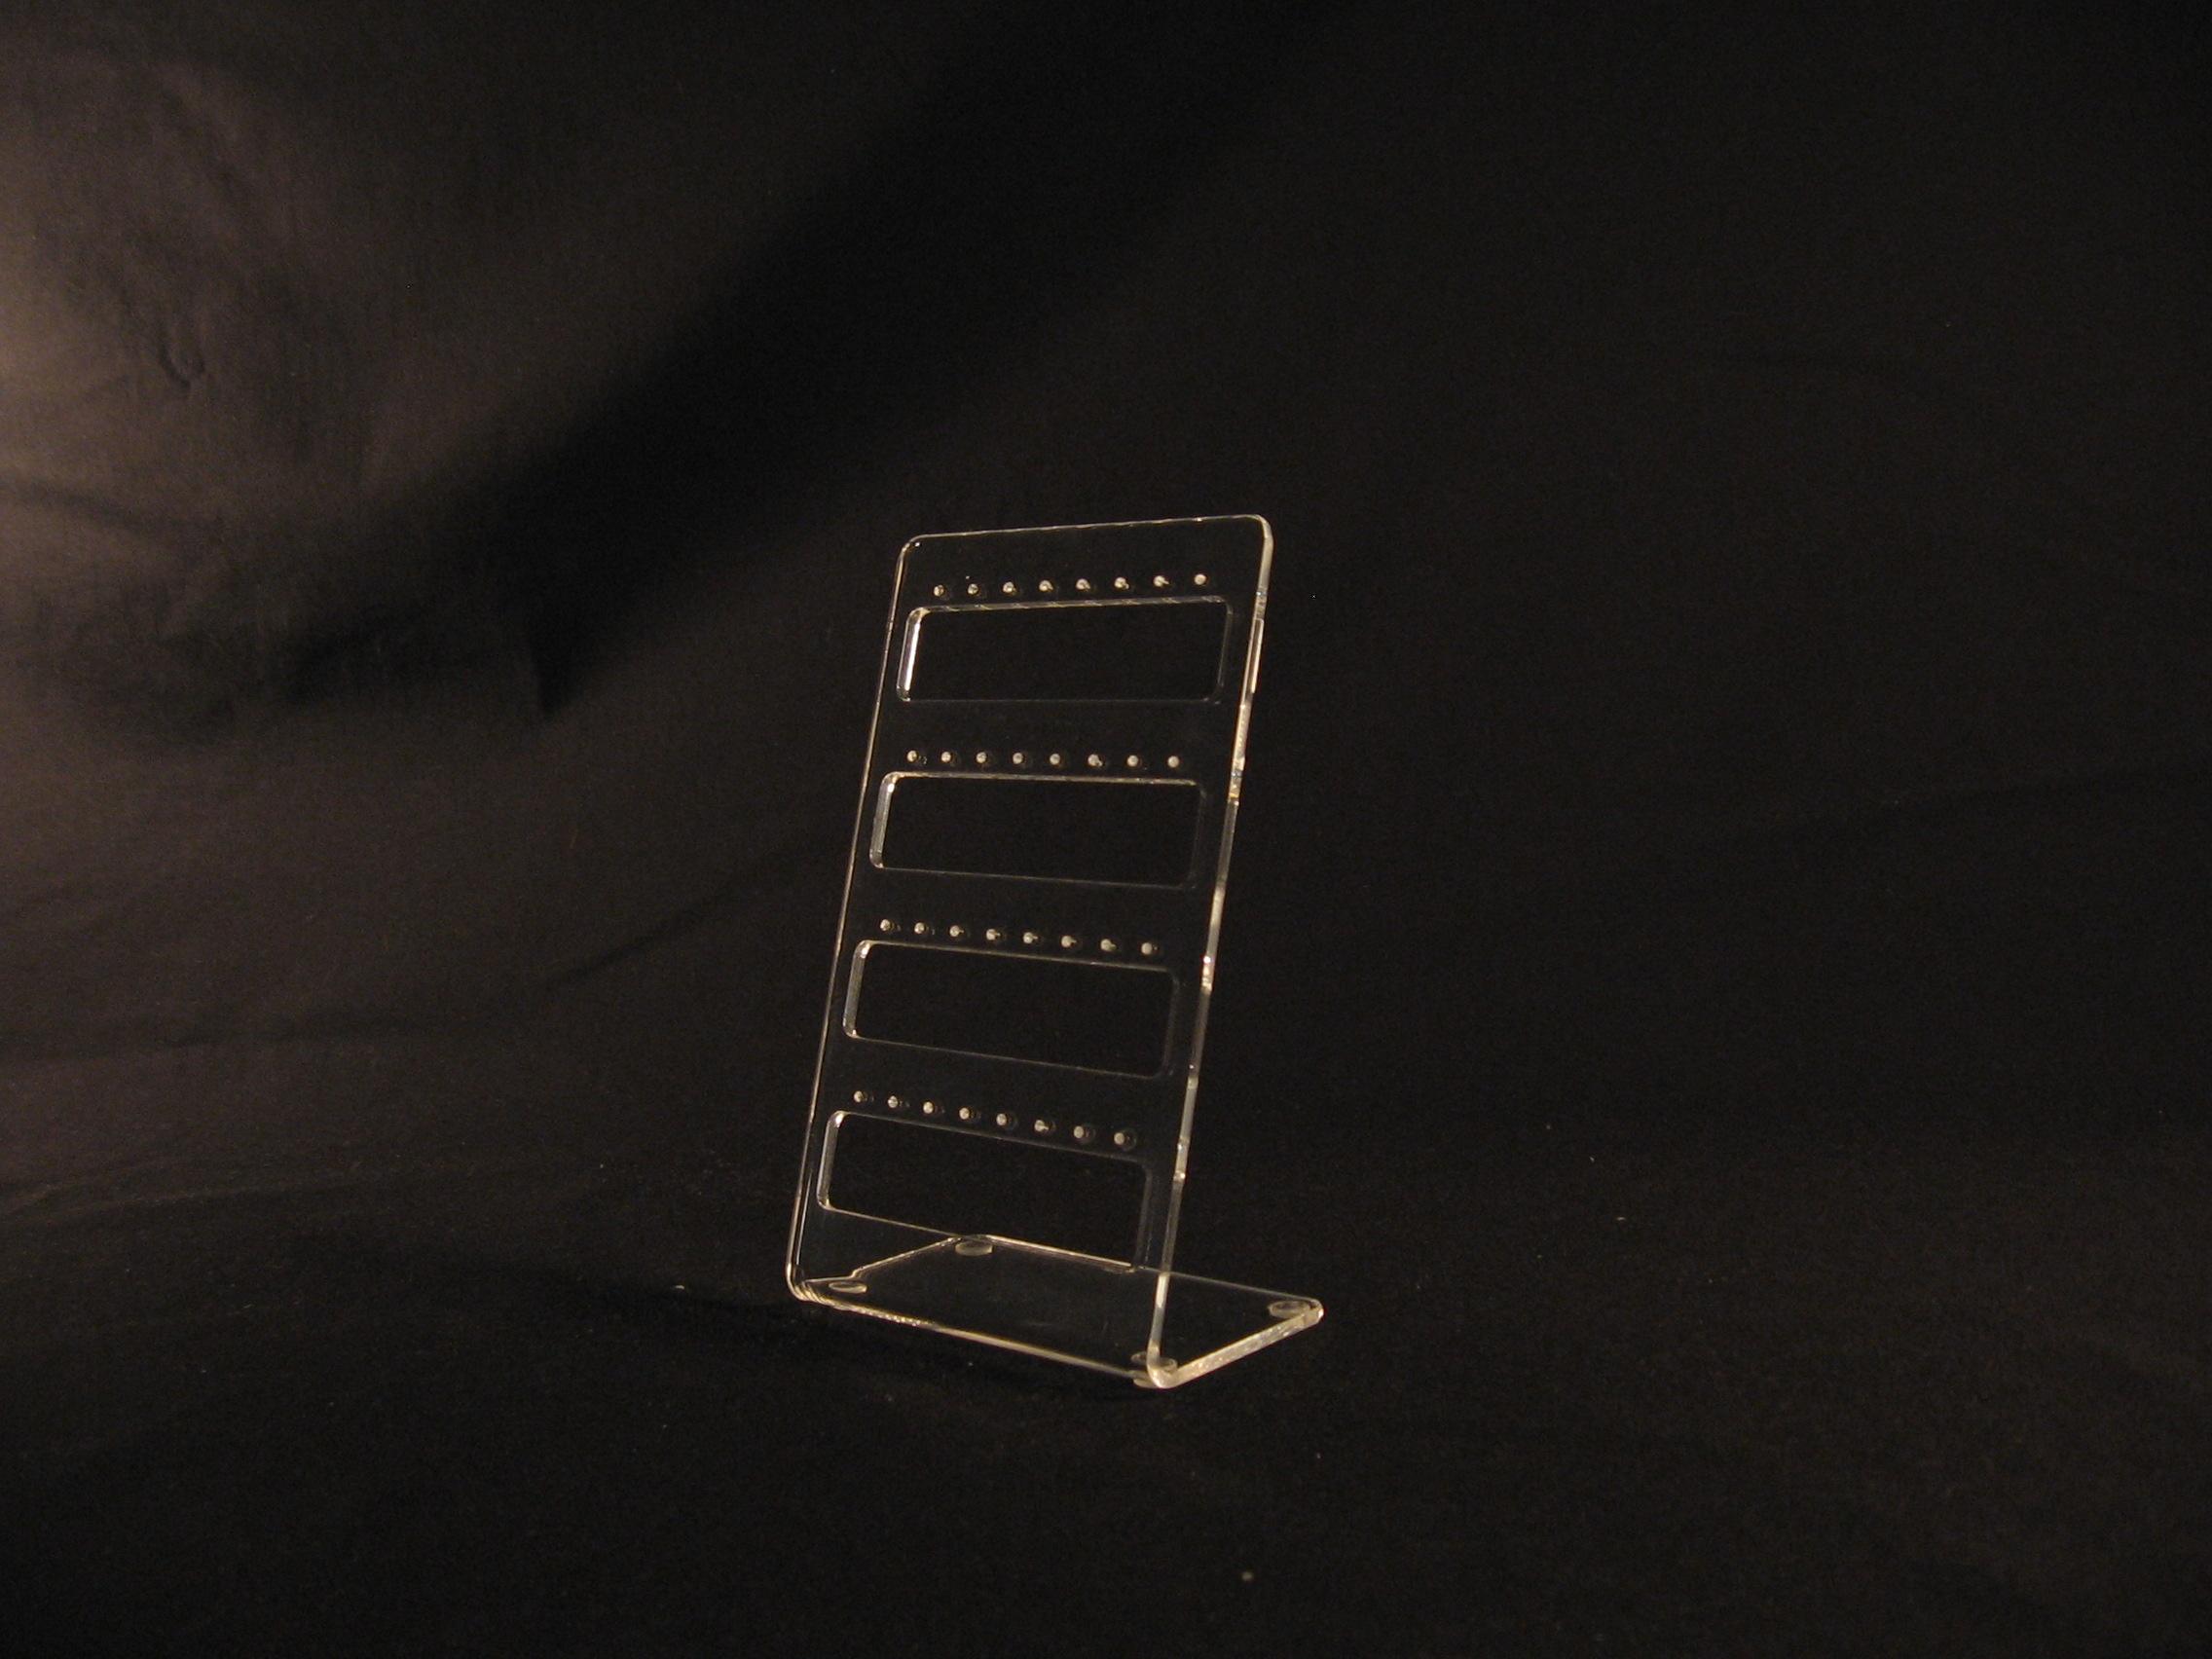 Stoni držač za nakit mindjuse pleksliglas klirit SNG2